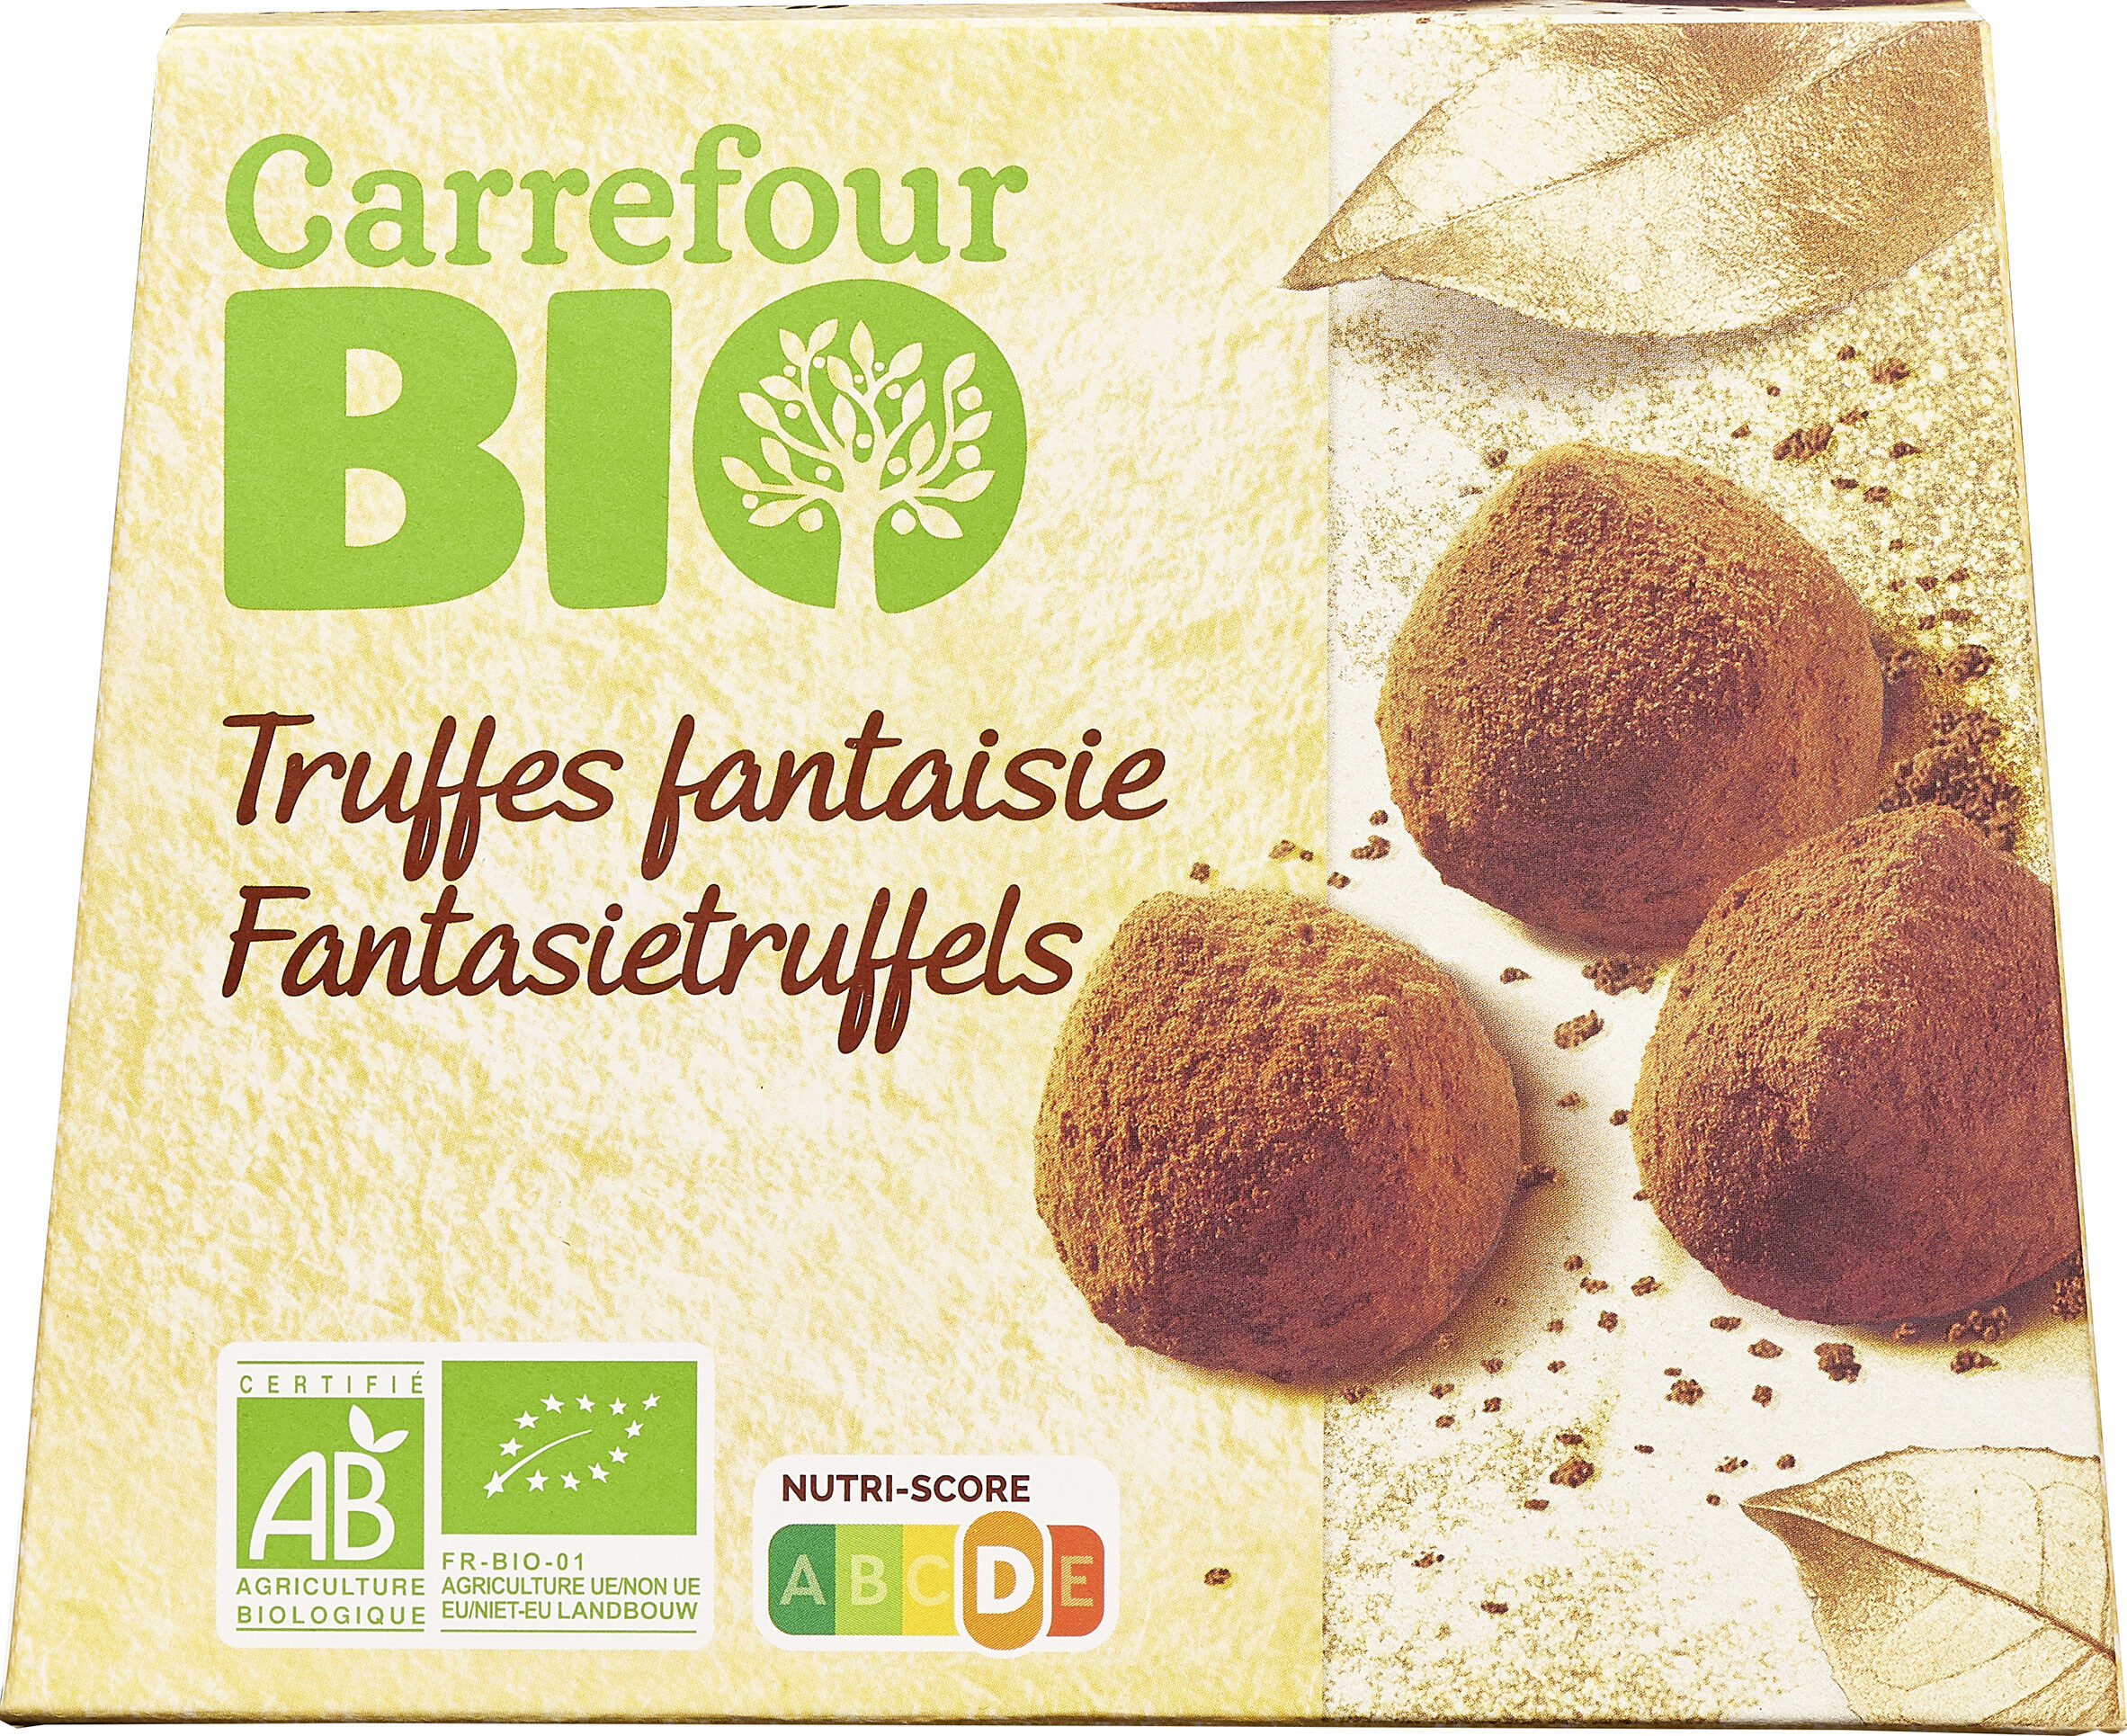 Truffes fantaisie - Product - fr